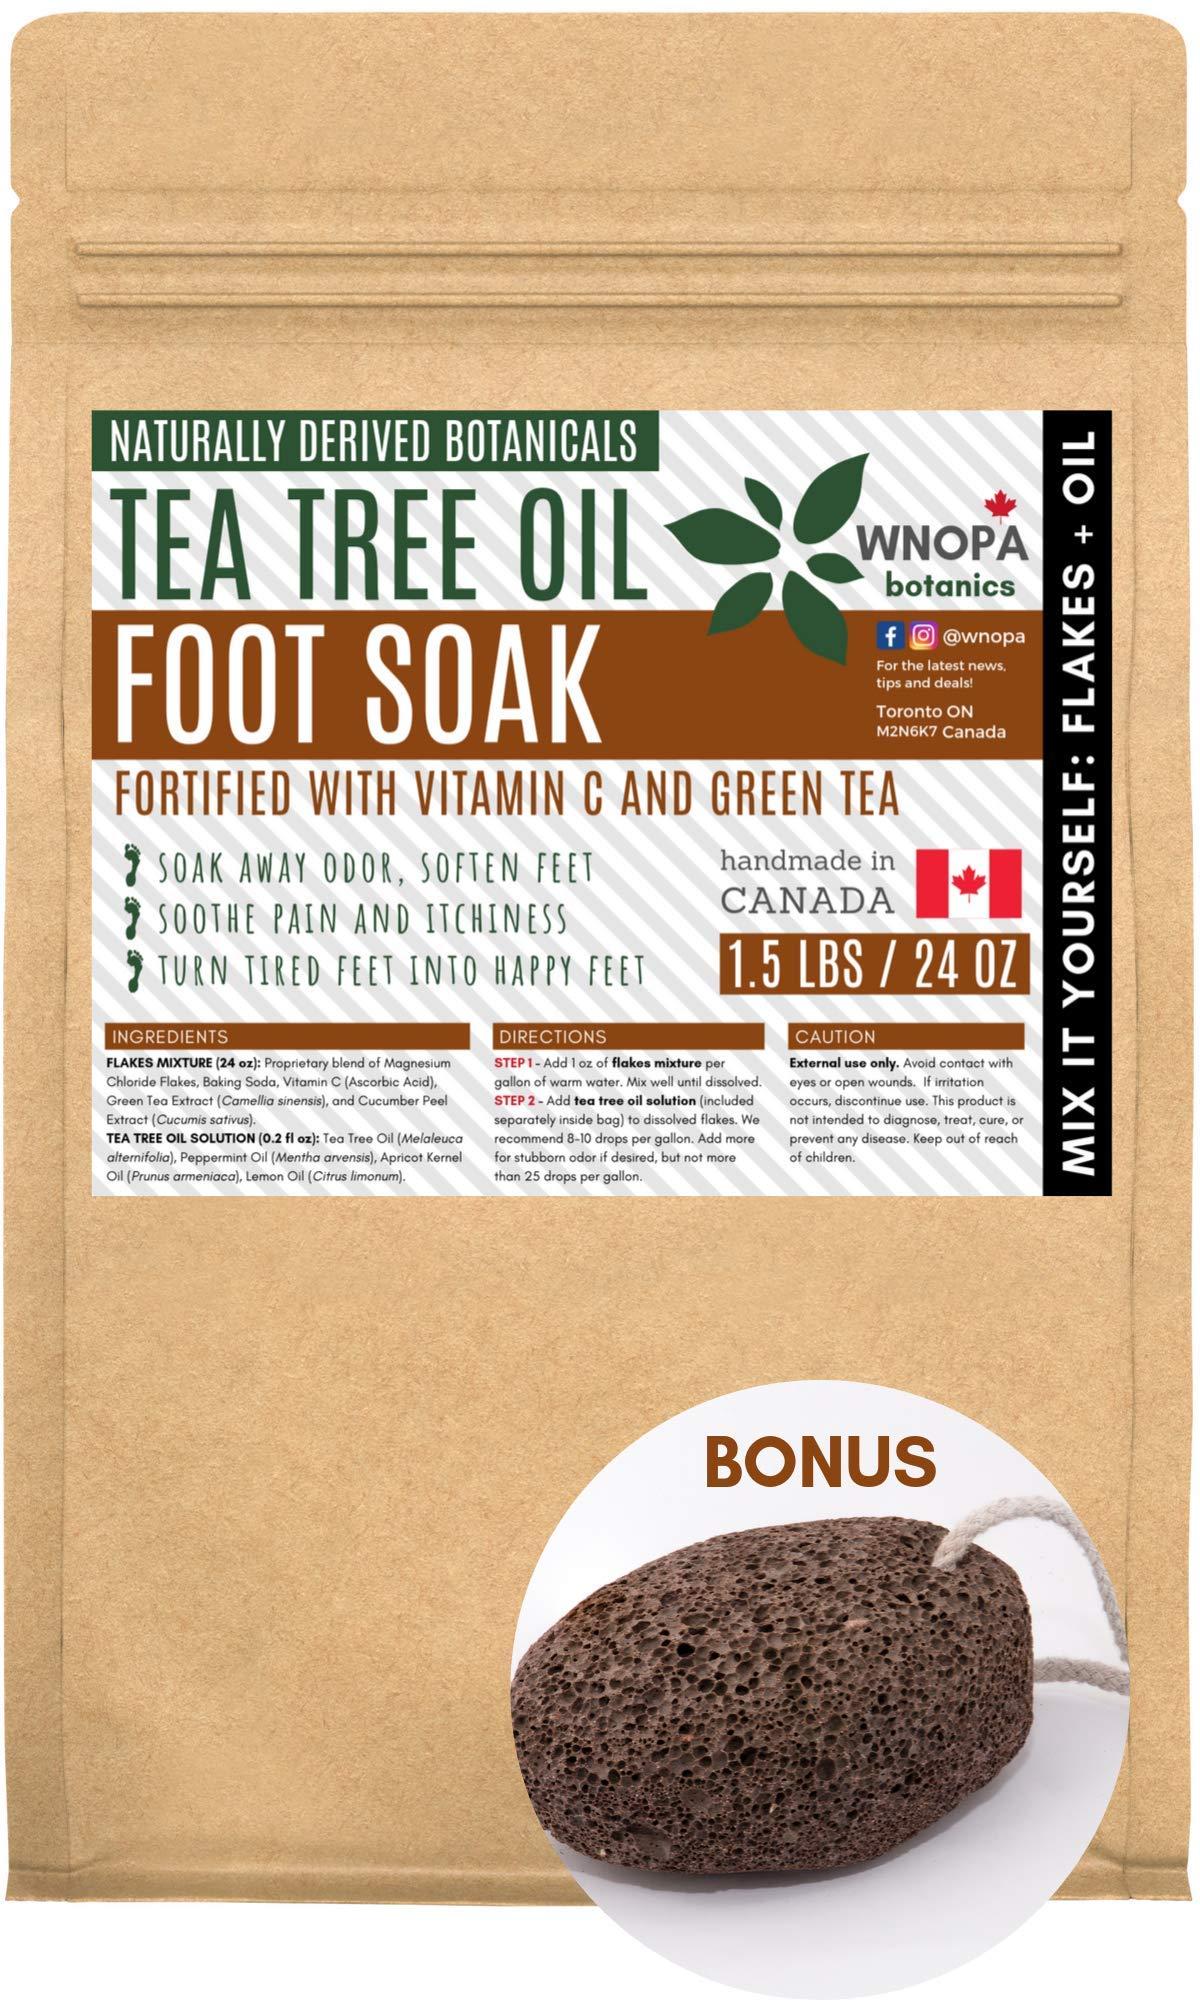 Handmade 100% Natural Tea Tree Oil Foot Soak Salts - Vitamin C & Green Tea Extract - Foot Care Dead Sea Salts For Soaking in Pedicure Foot Soak Tub - Made in Canada - 1.5 LB & Bonus Lava Pumice Stone by WNOPA